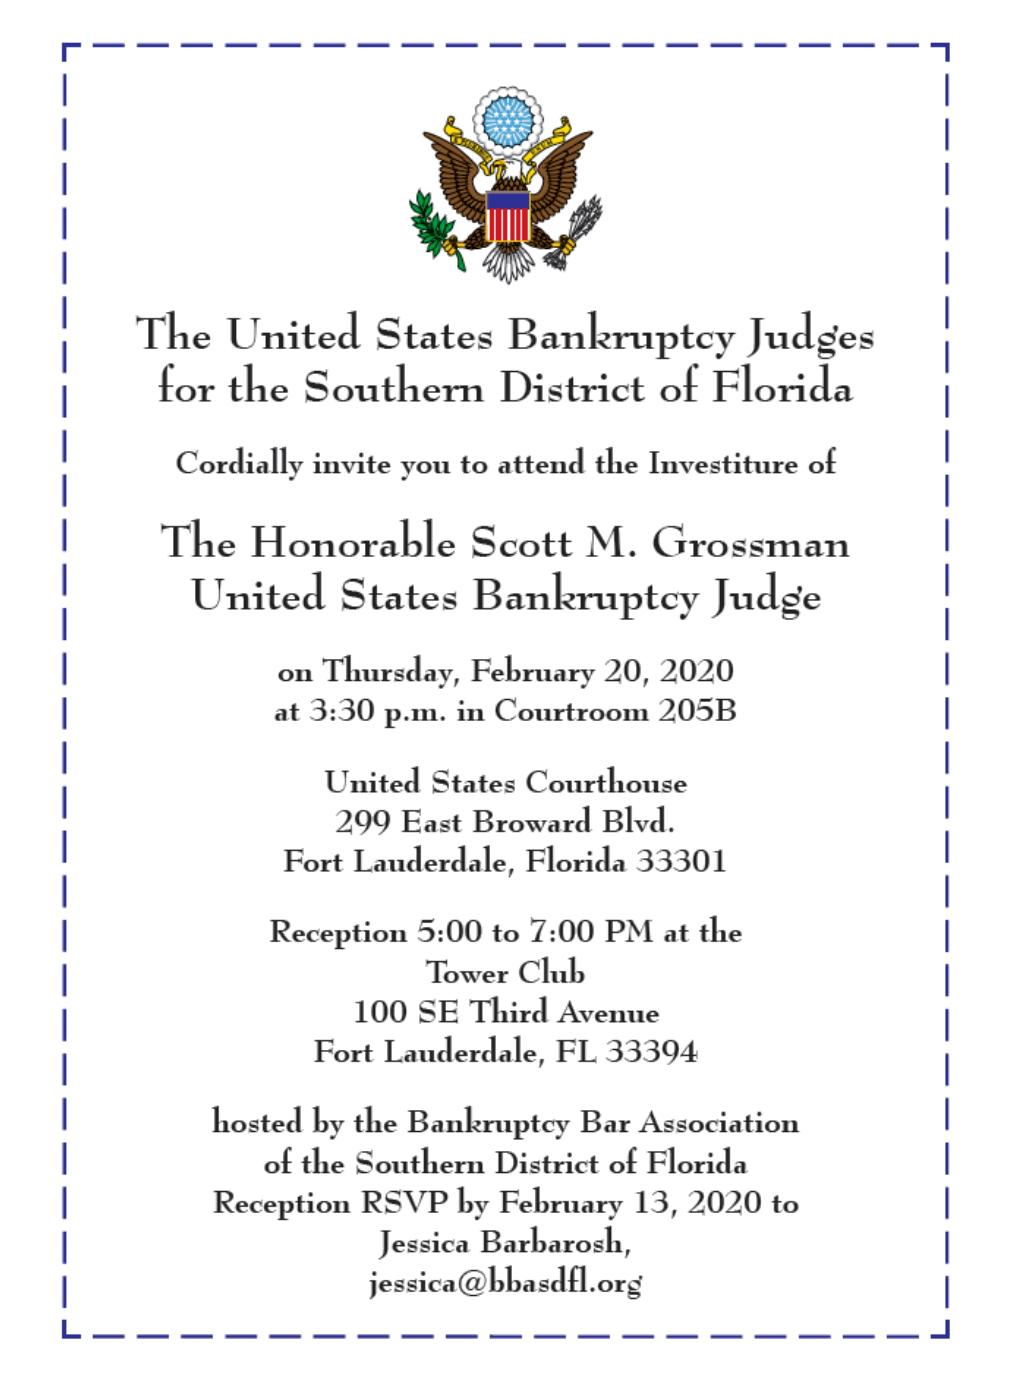 The Honorable Scott M. Grossman